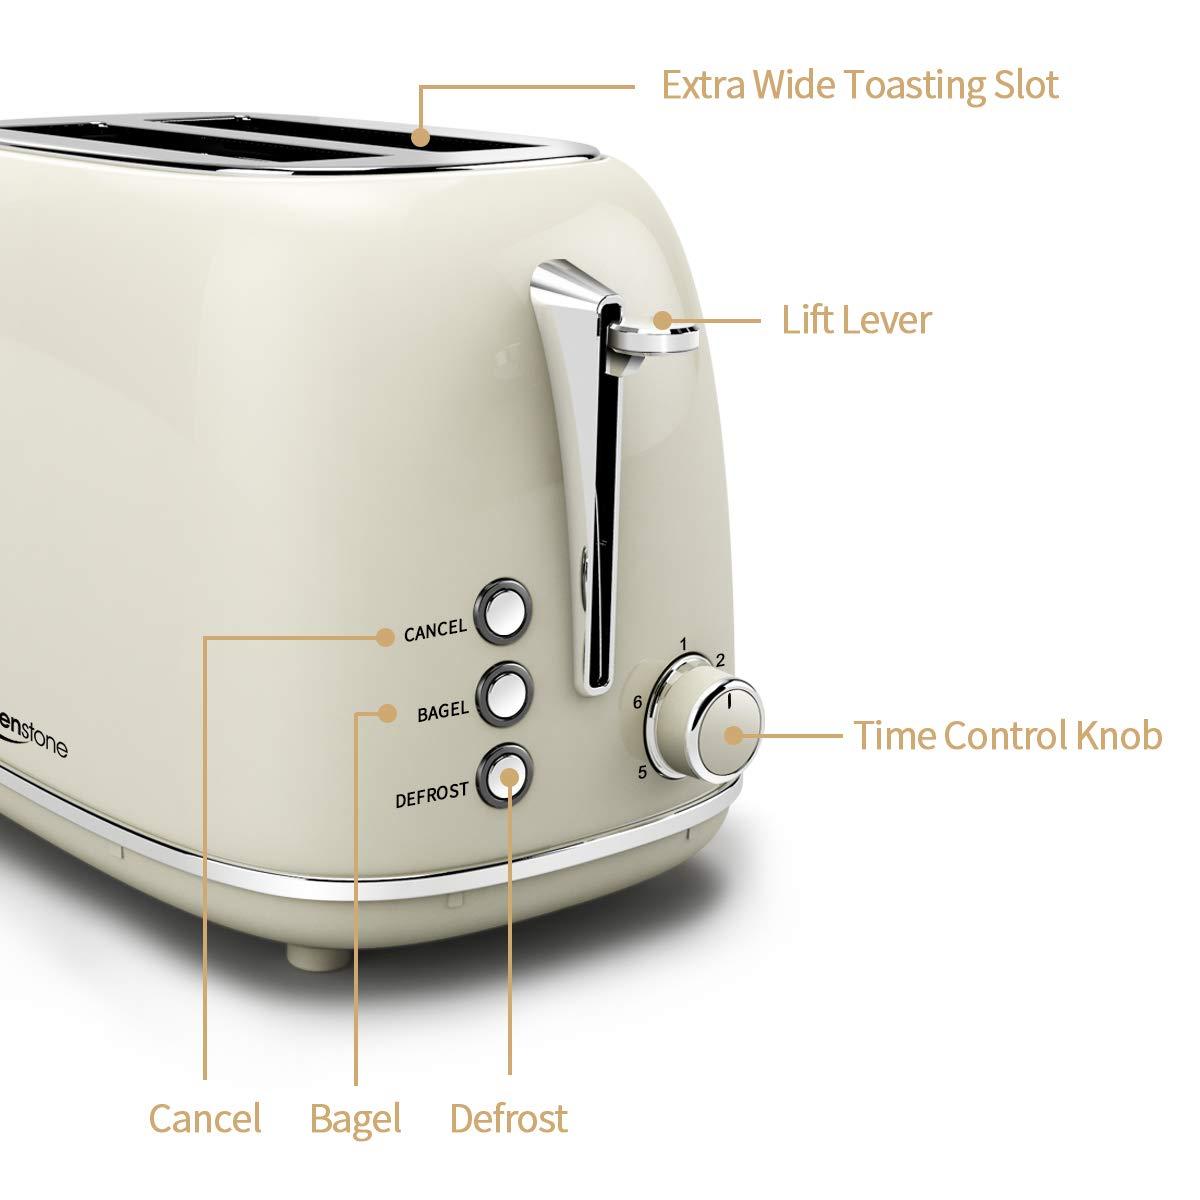 Amazon.com: Keenstone - Tostadora de 2 rebanadas: Kitchen ...